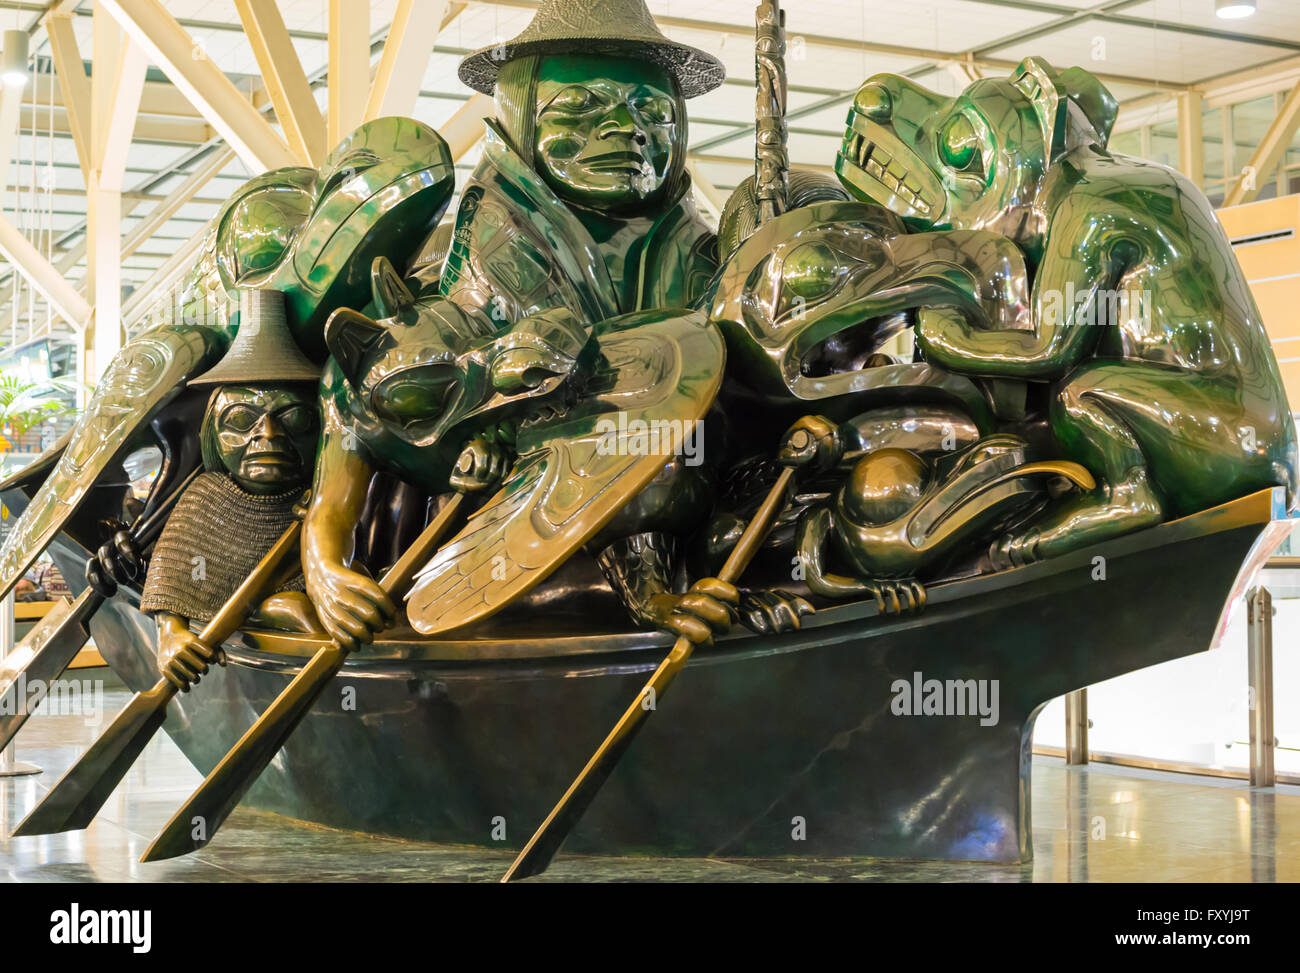 the-jade-canoe-version-of-the-spirit-of-